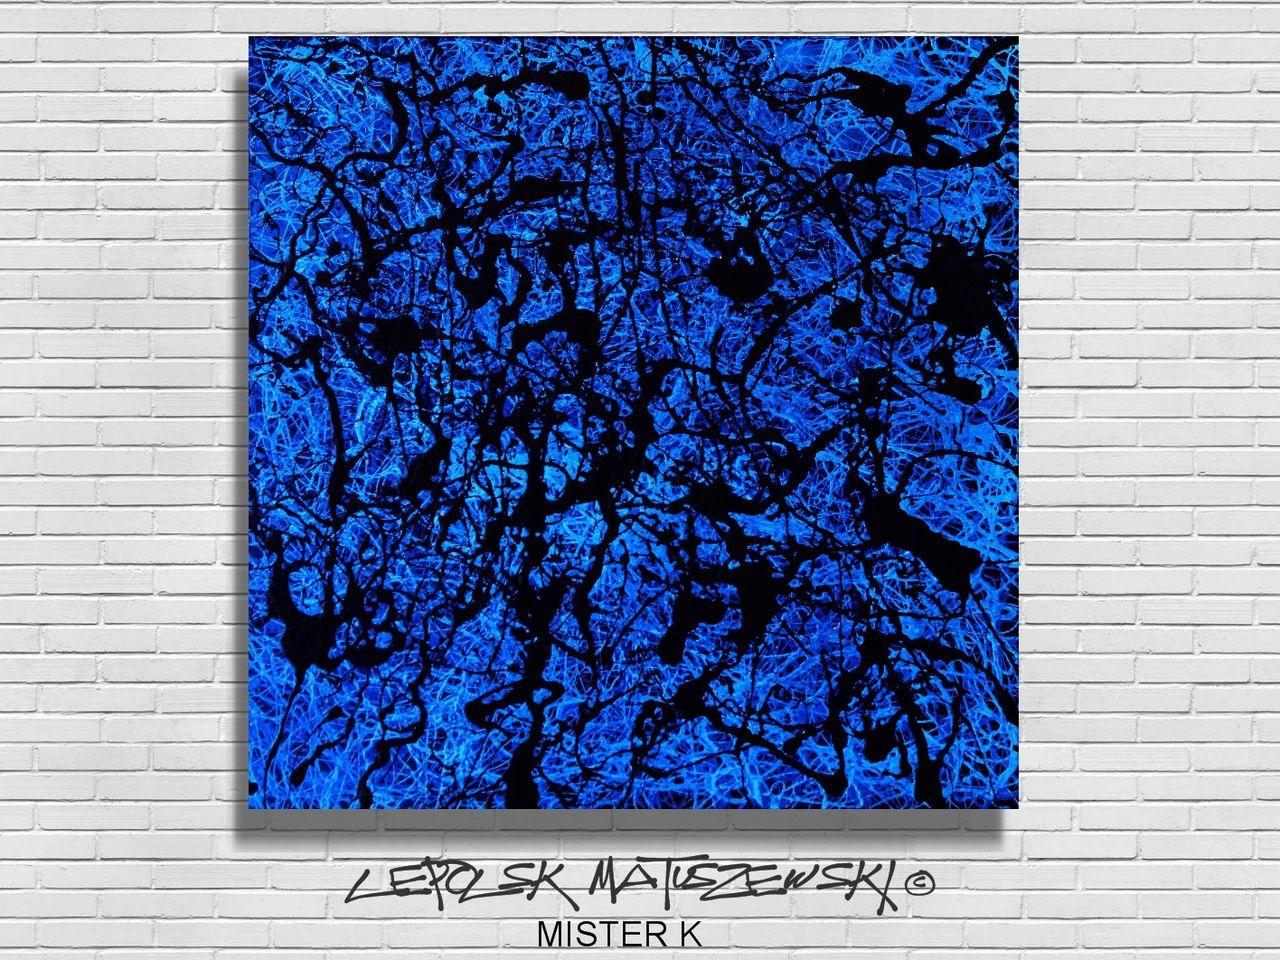 LEPOLSK MATUSZEWSKI BLUE RAIN  abstract Expressionnism  2015 Lepolsk